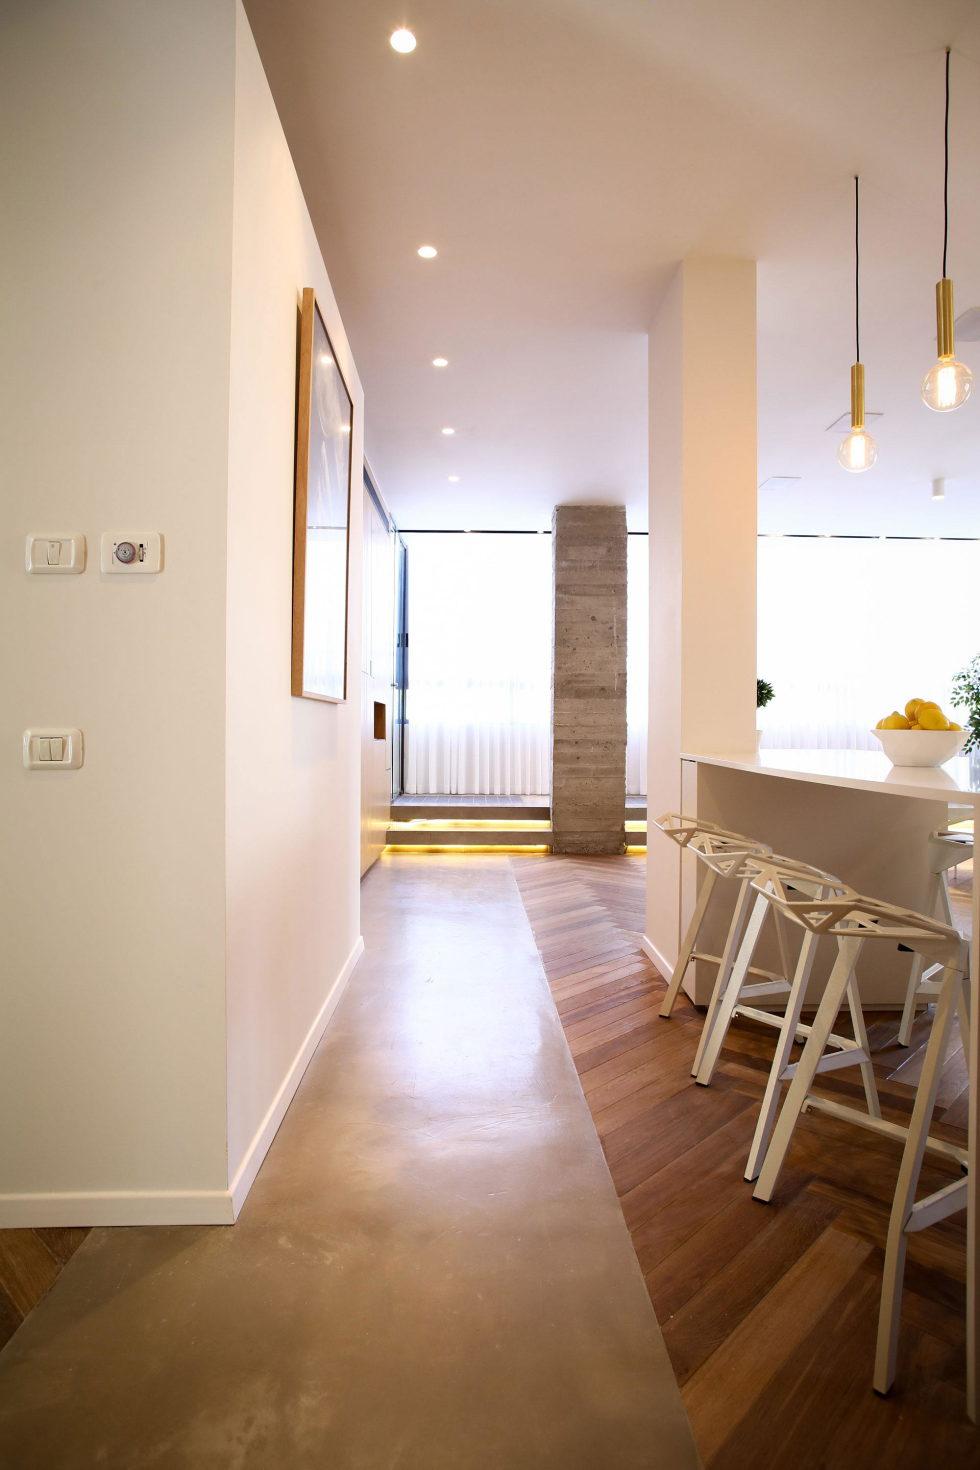 Tlv Gordon 8.2- The Apartment In Tel Aviv 17